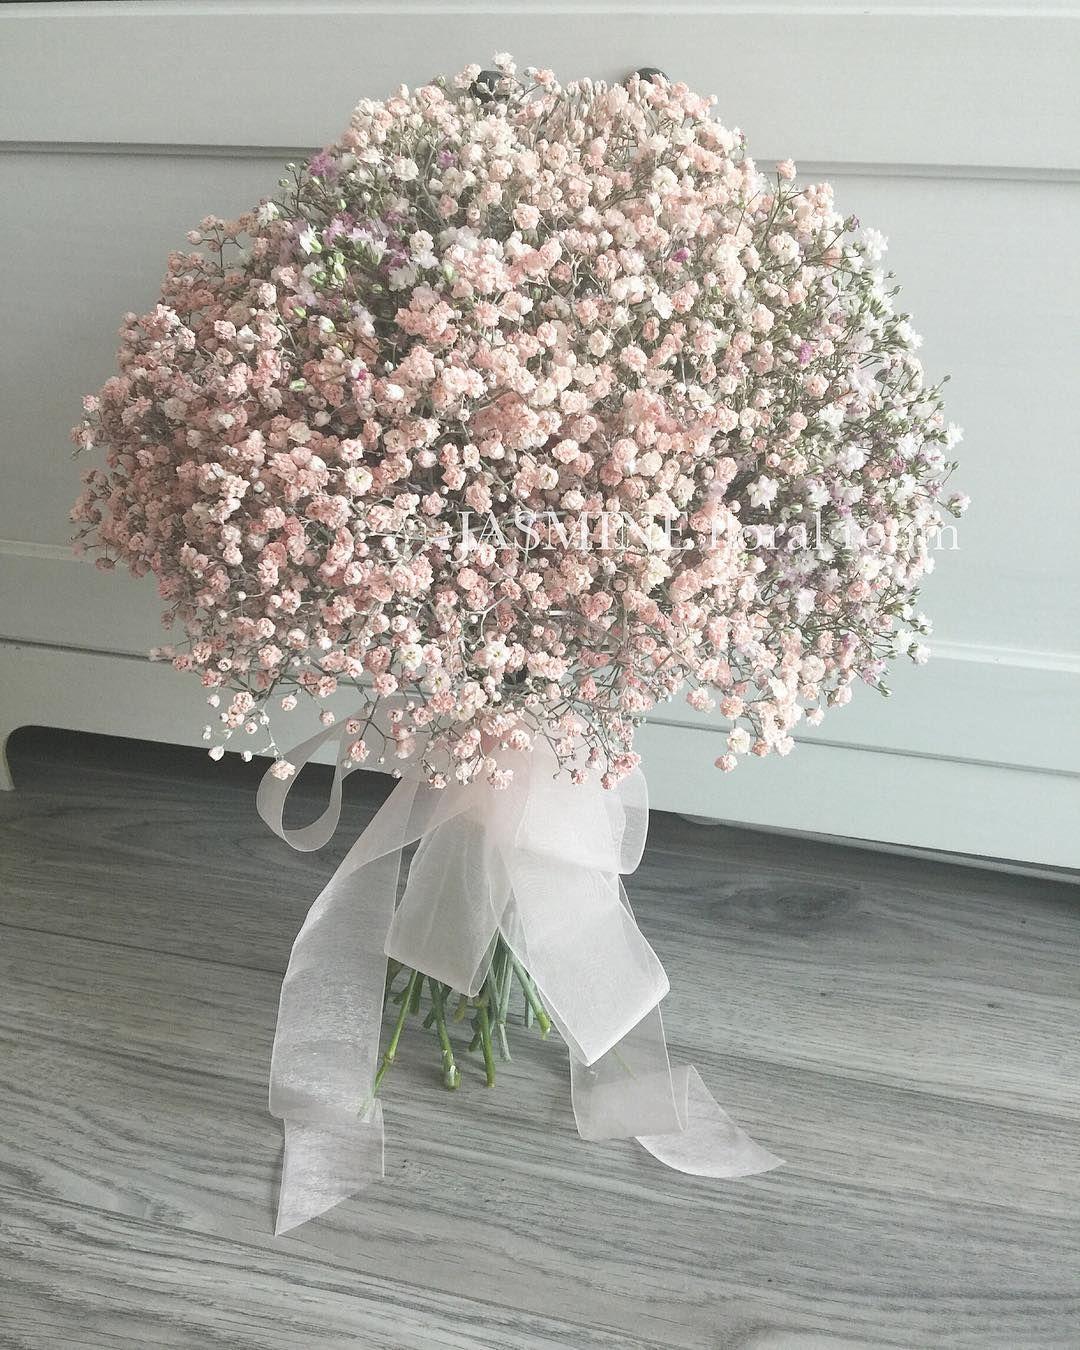 A Pale Pink Baby S Breath Bride Bouquet For Magazine Photo Shooting Stay Tuned Jasminefloralroom Bride Bridalbouquet Bo đam Cưới Hoa đẹp Hoa Cuc Họa Mi